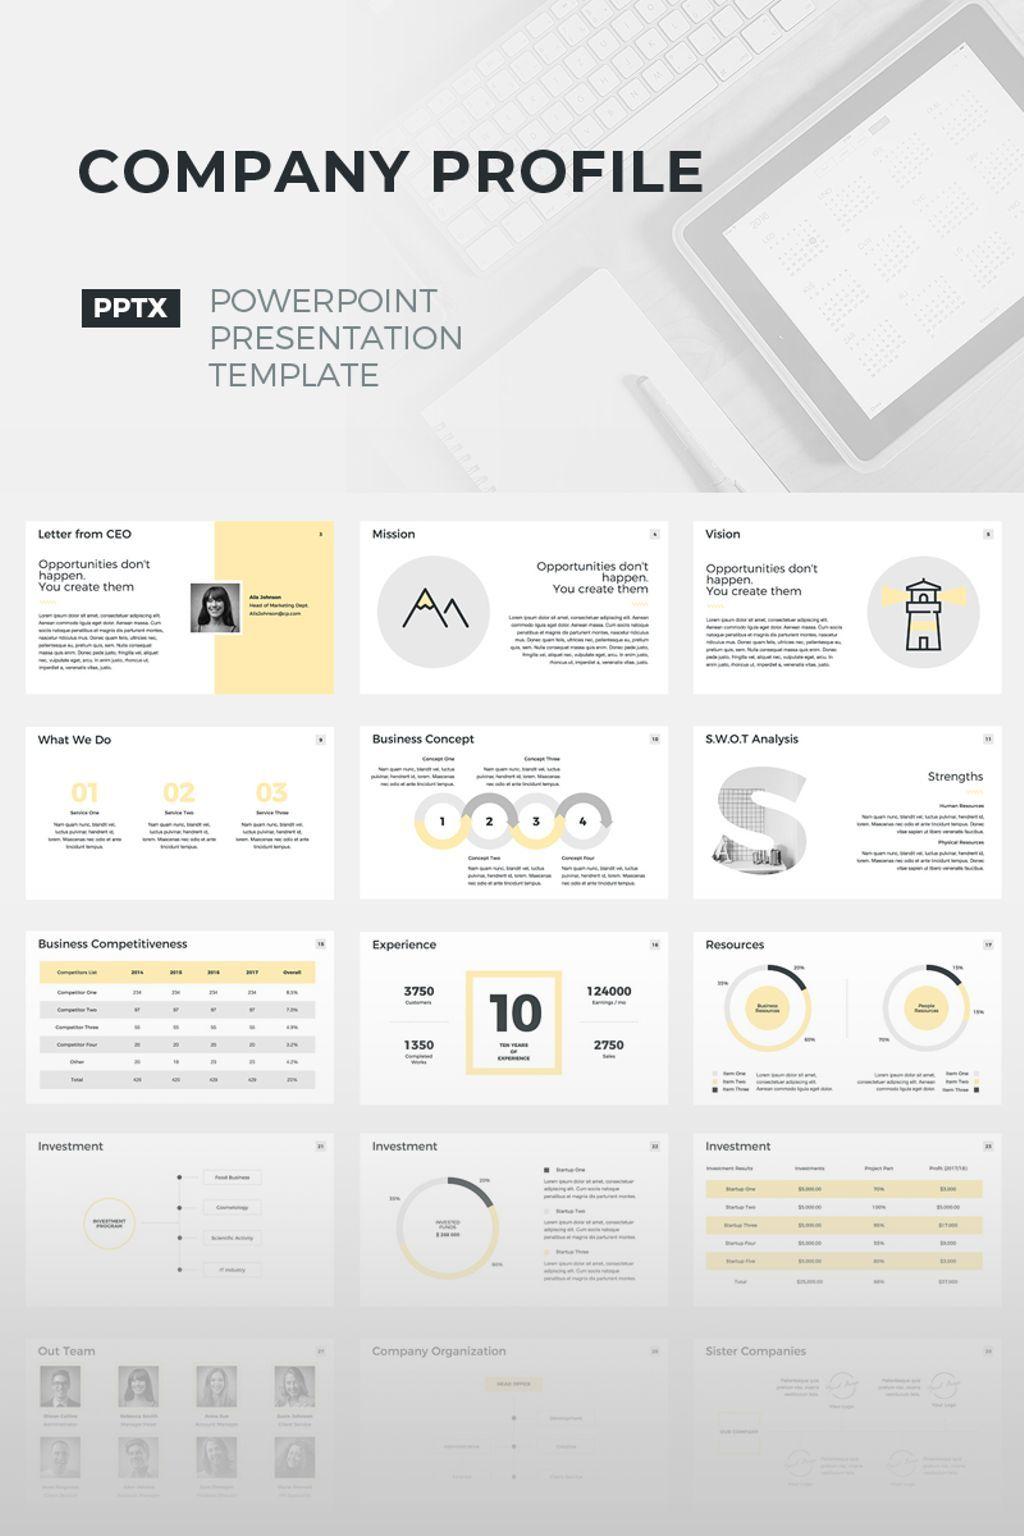 Company Profile Powerpoint Template 67157 Pengasuh Pengasuh Anak